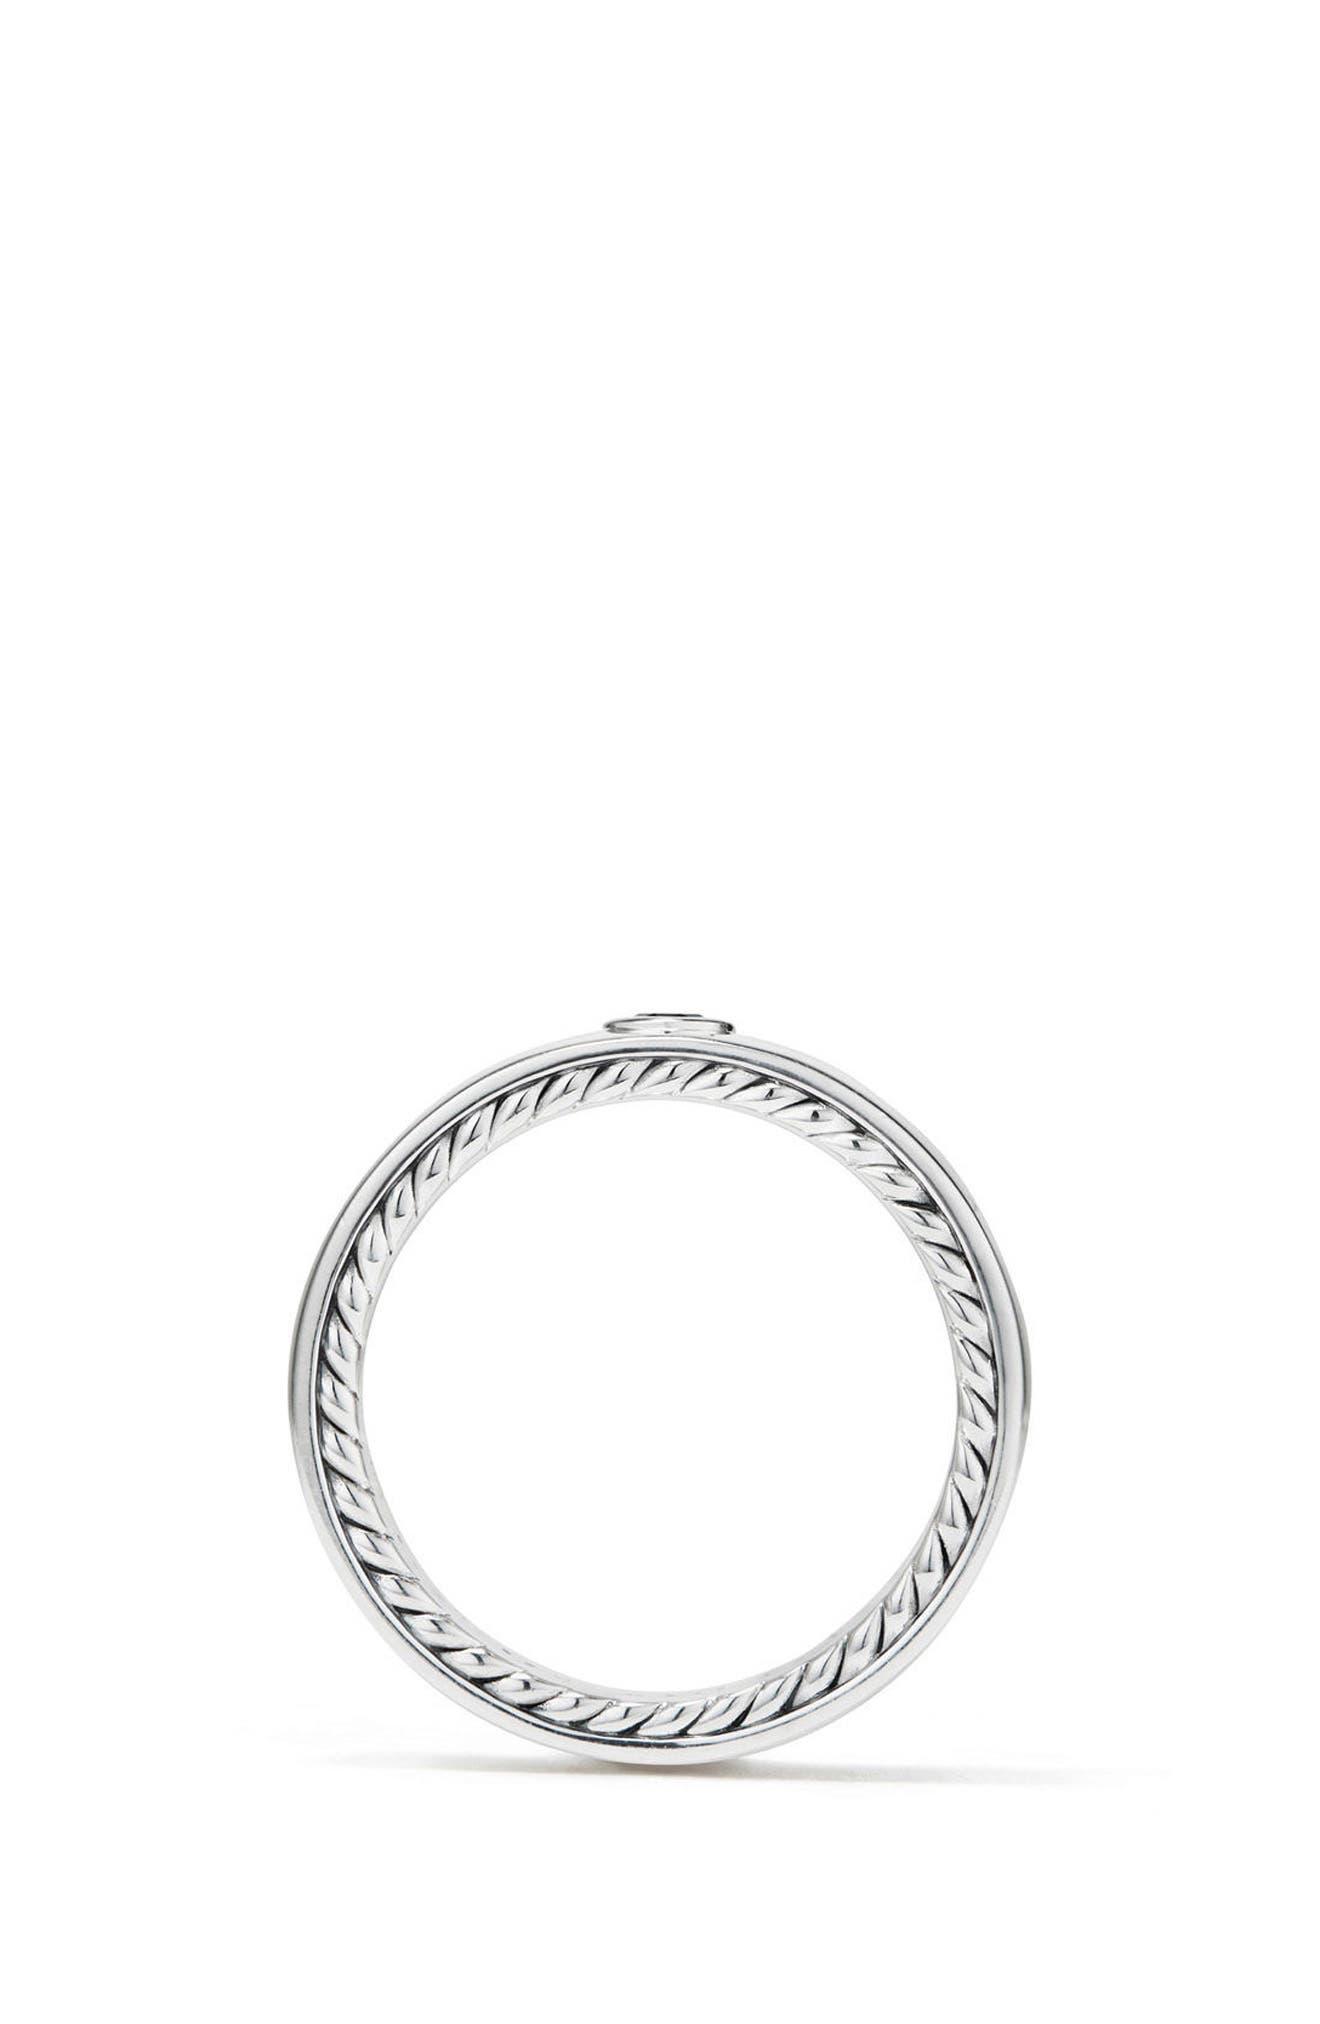 Streamline Band Ring with Black Diamond, 6mm,                             Alternate thumbnail 2, color,                             SILVER/ BLACK DIAMOND